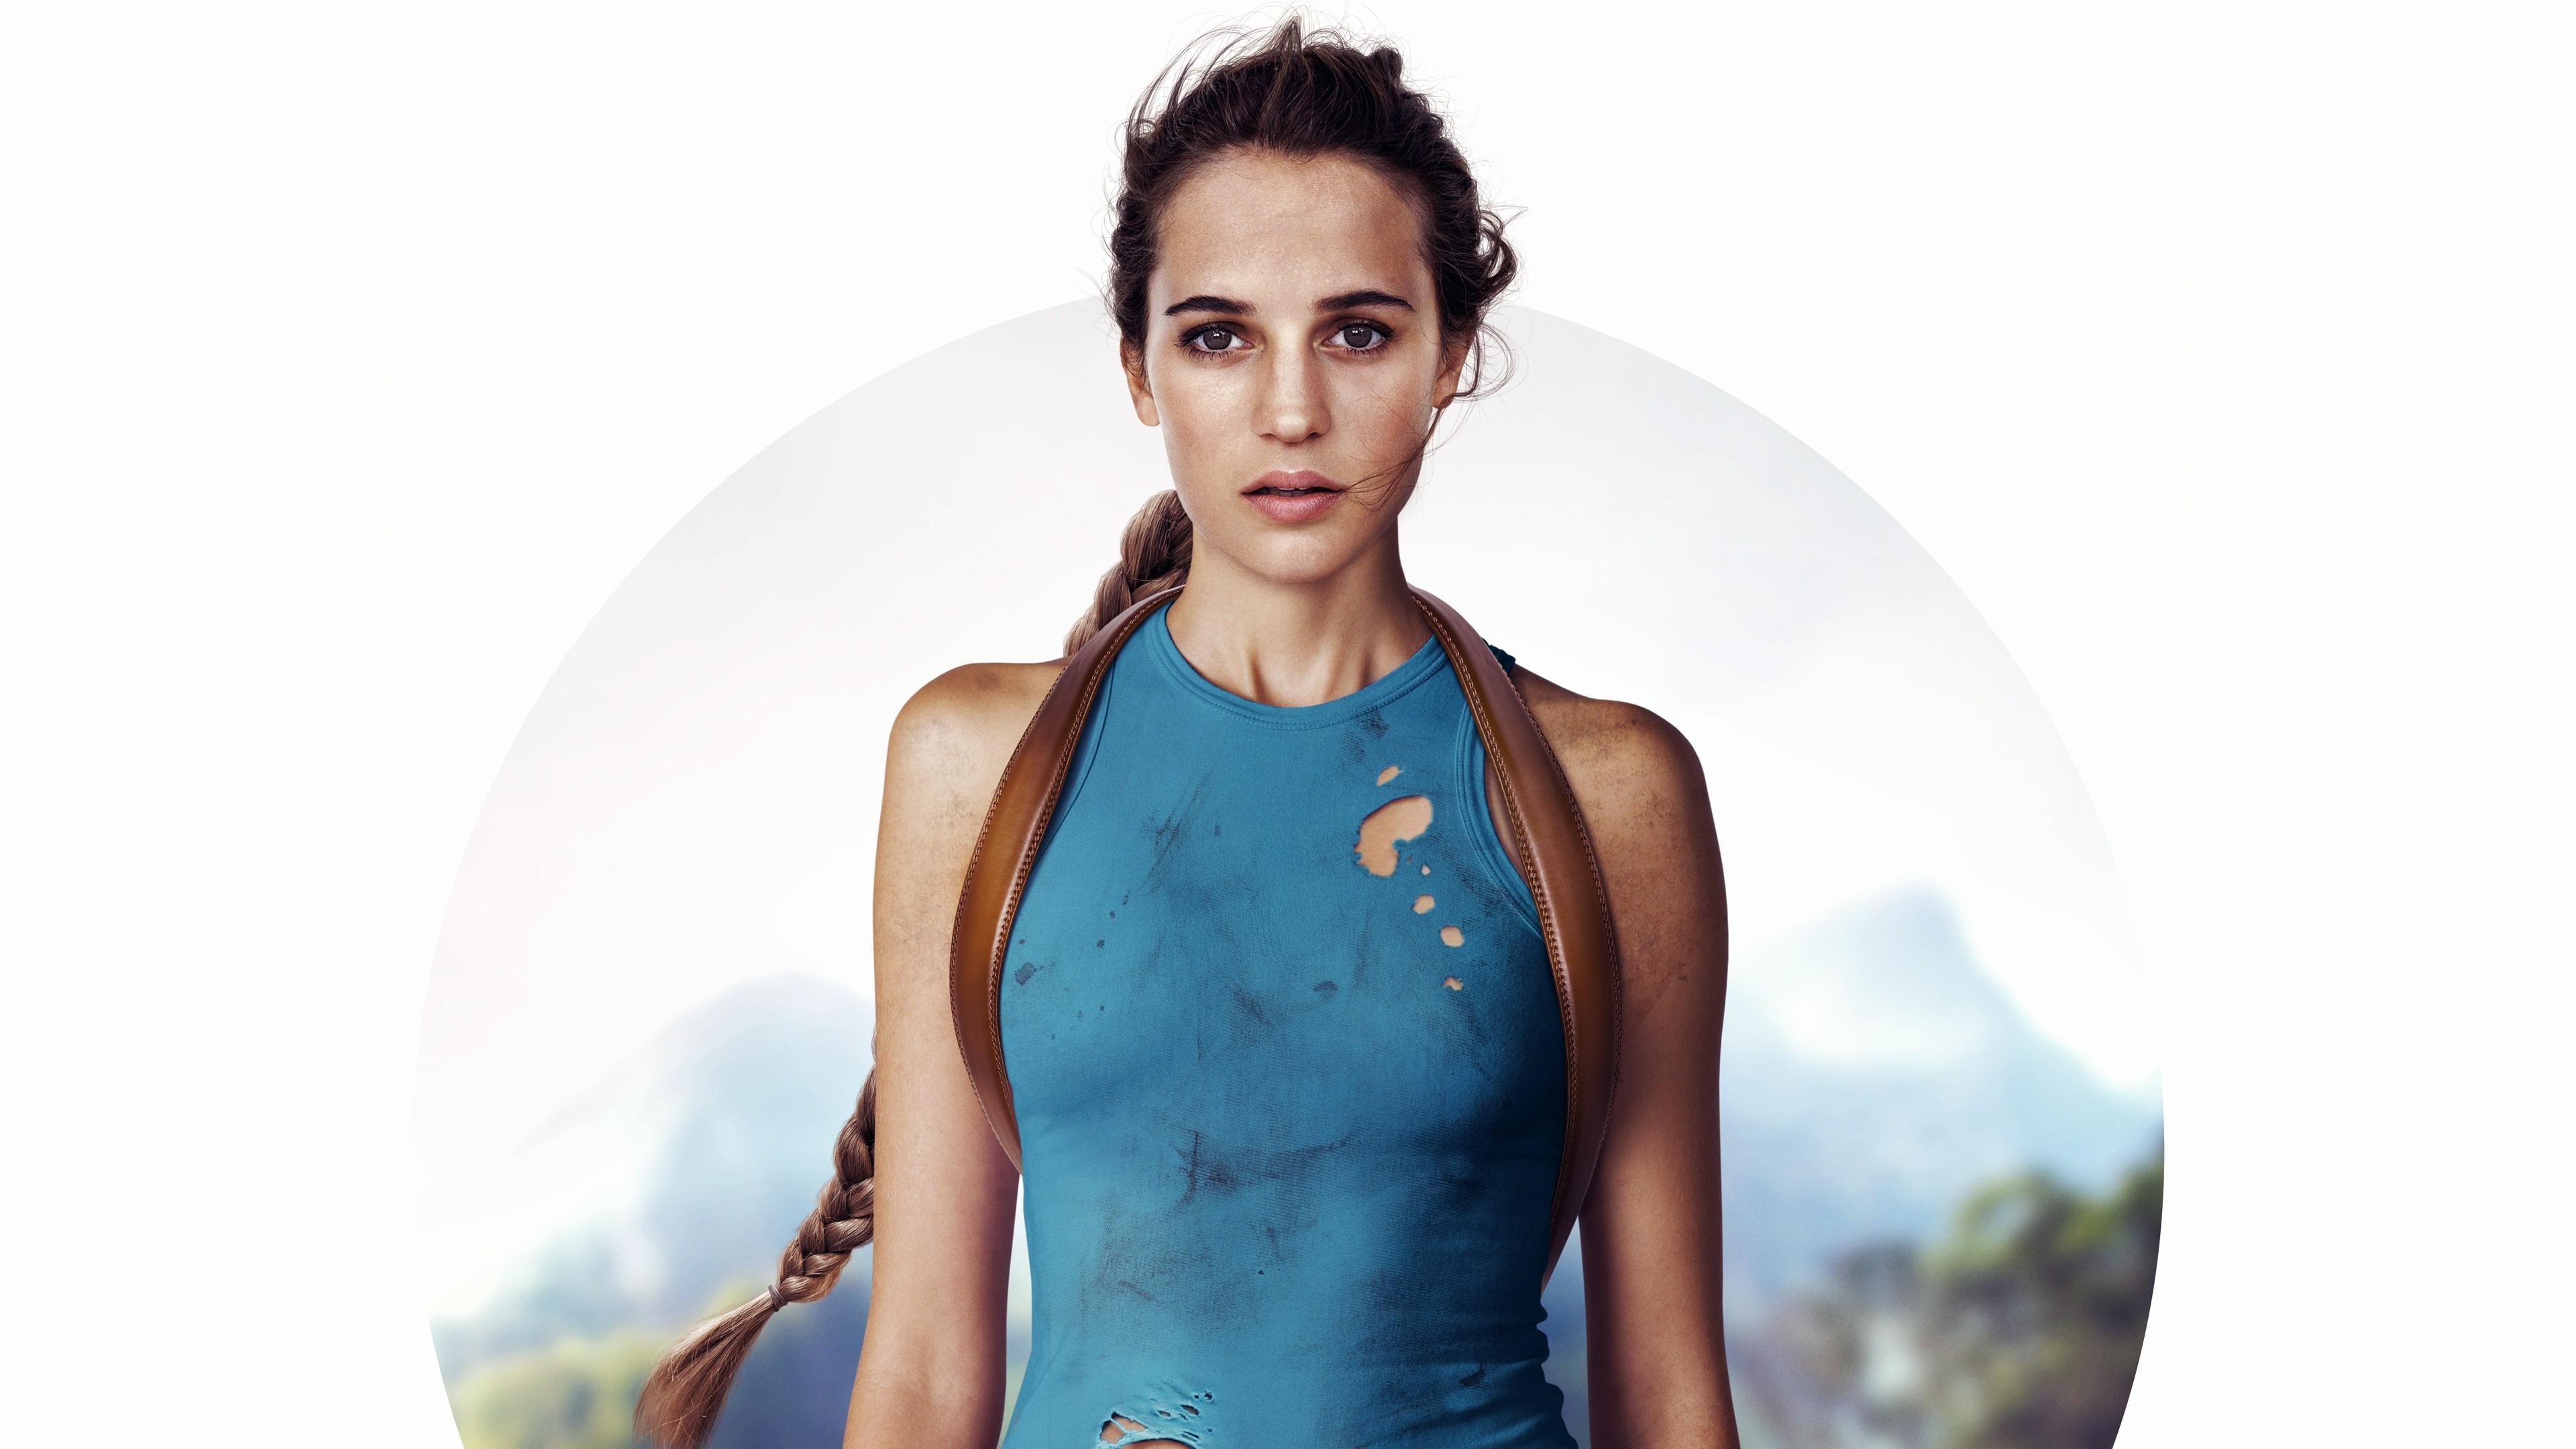 Wallpaper Lara Croft Tomb Raider Alicia Vikander 4k Movies 15866 3840x2160